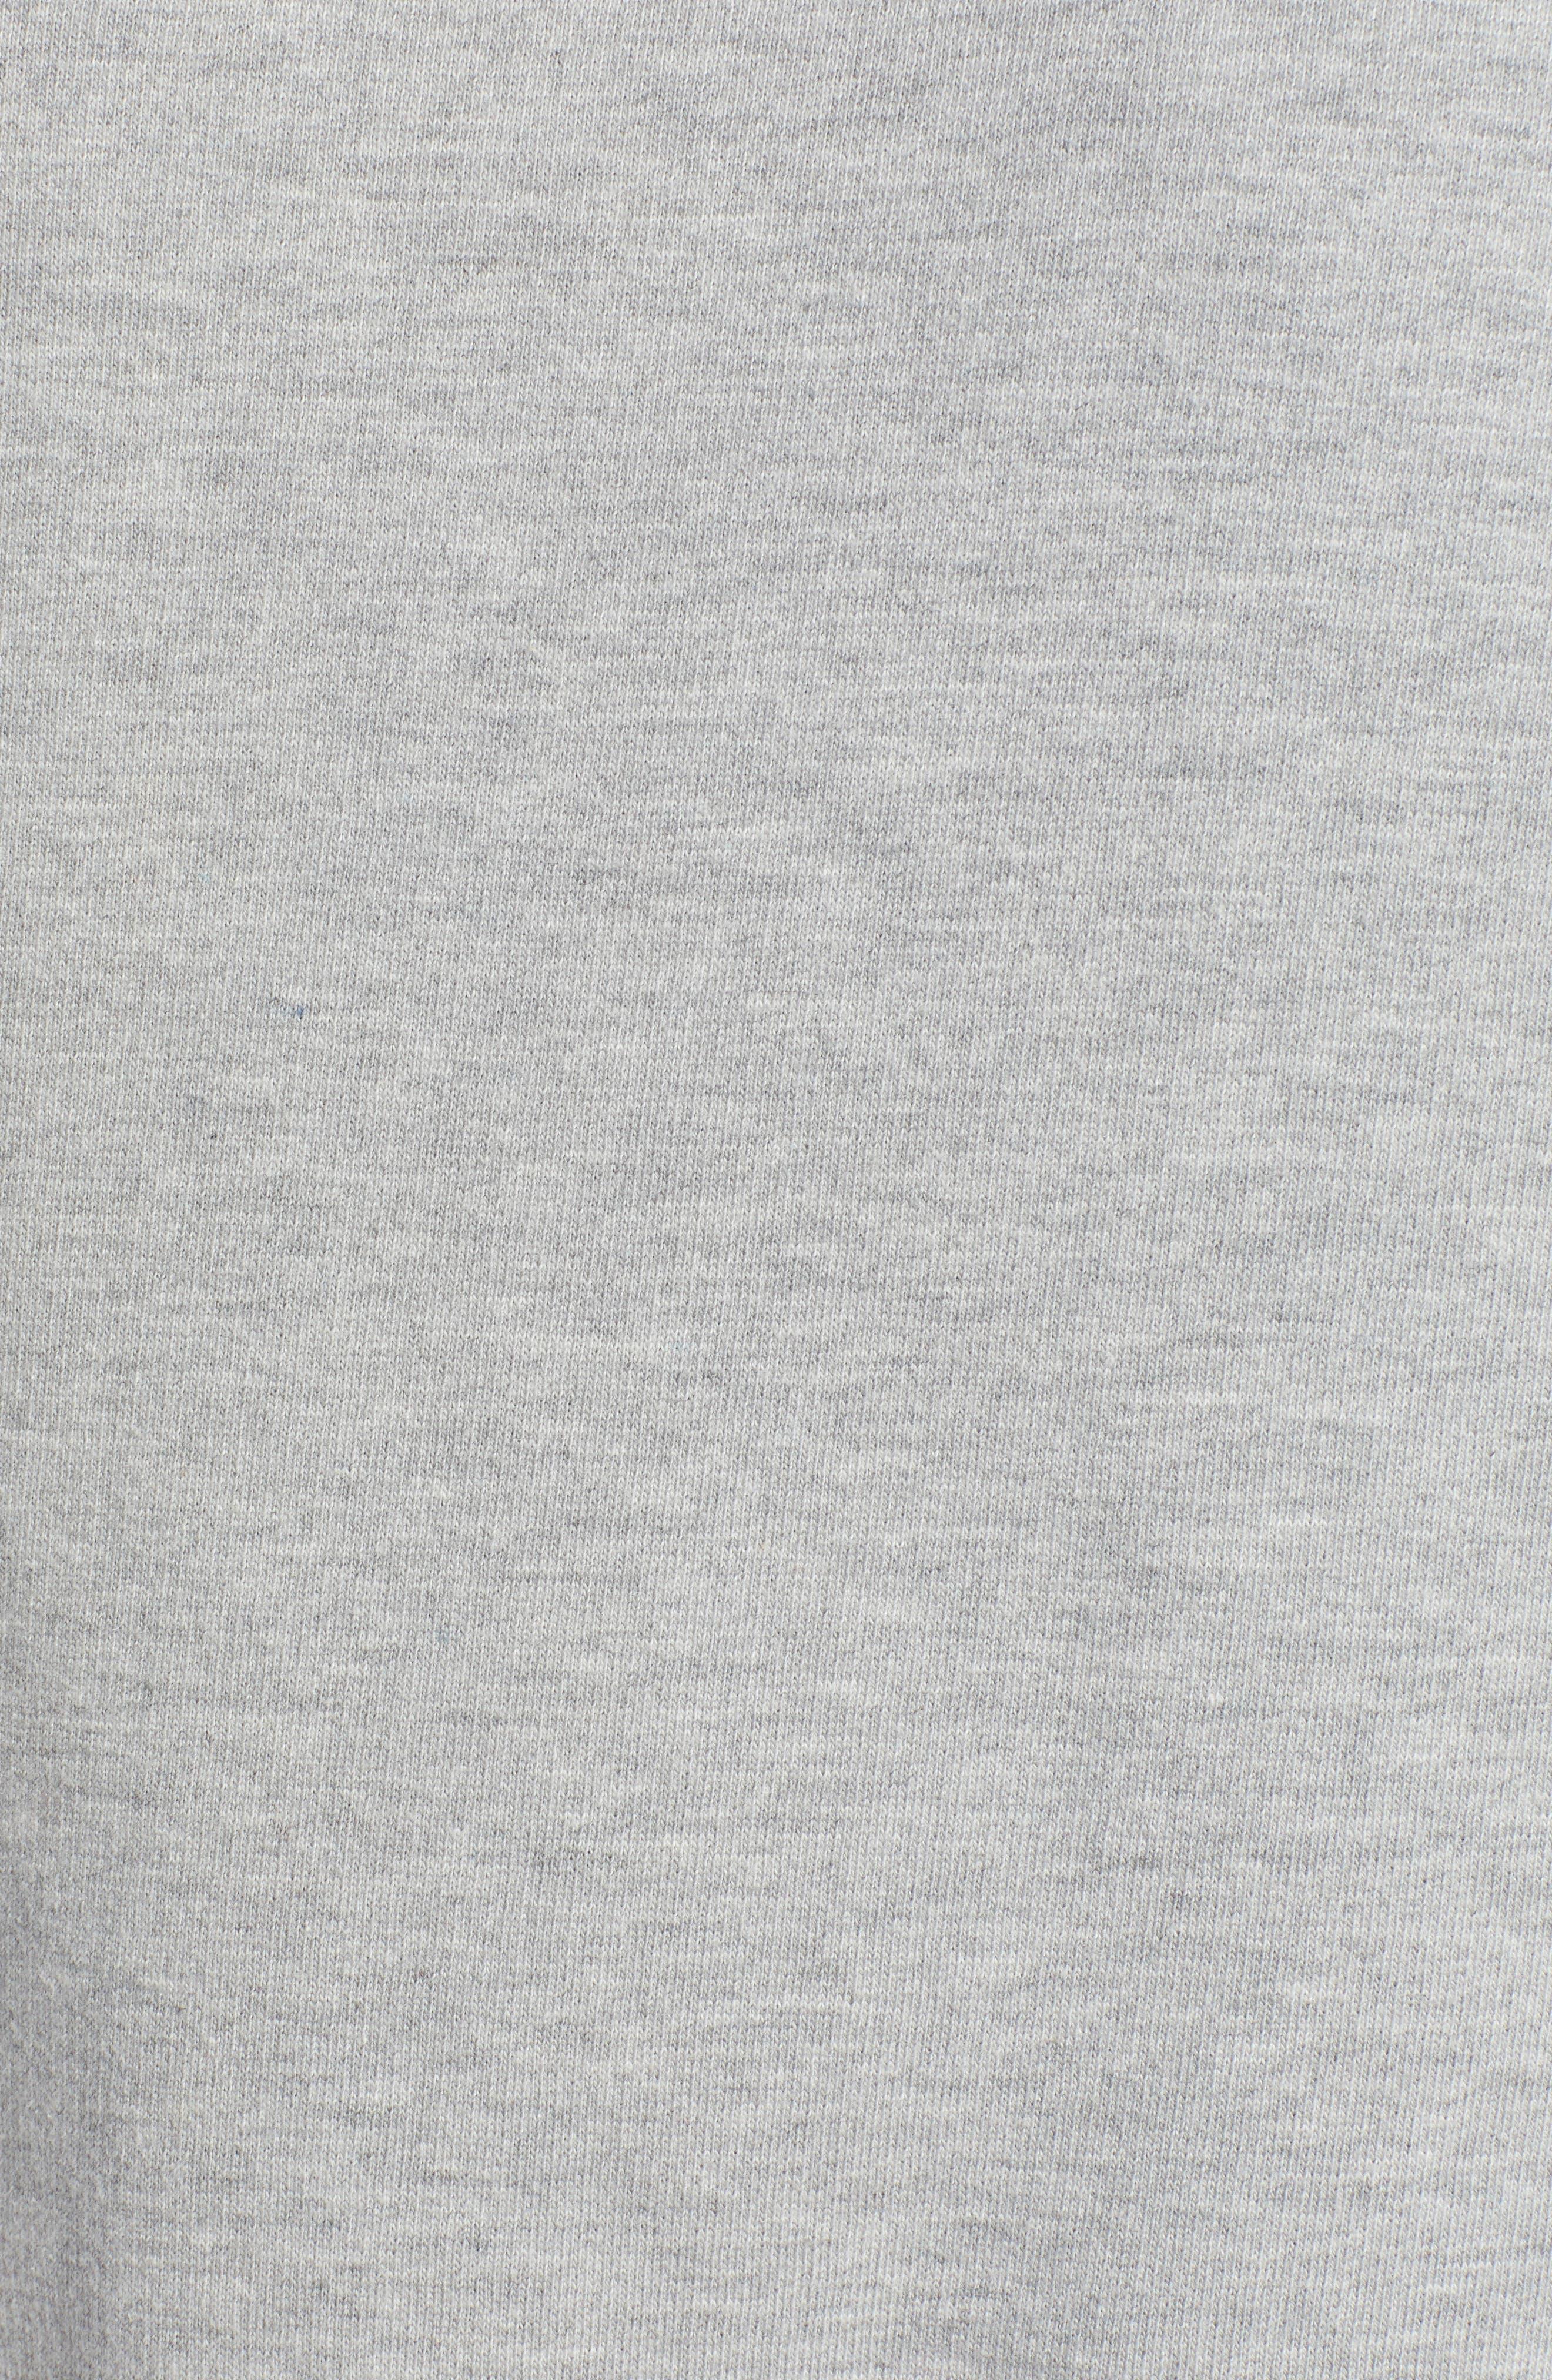 Etoile Sweatshirt,                             Alternate thumbnail 5, color,                             030